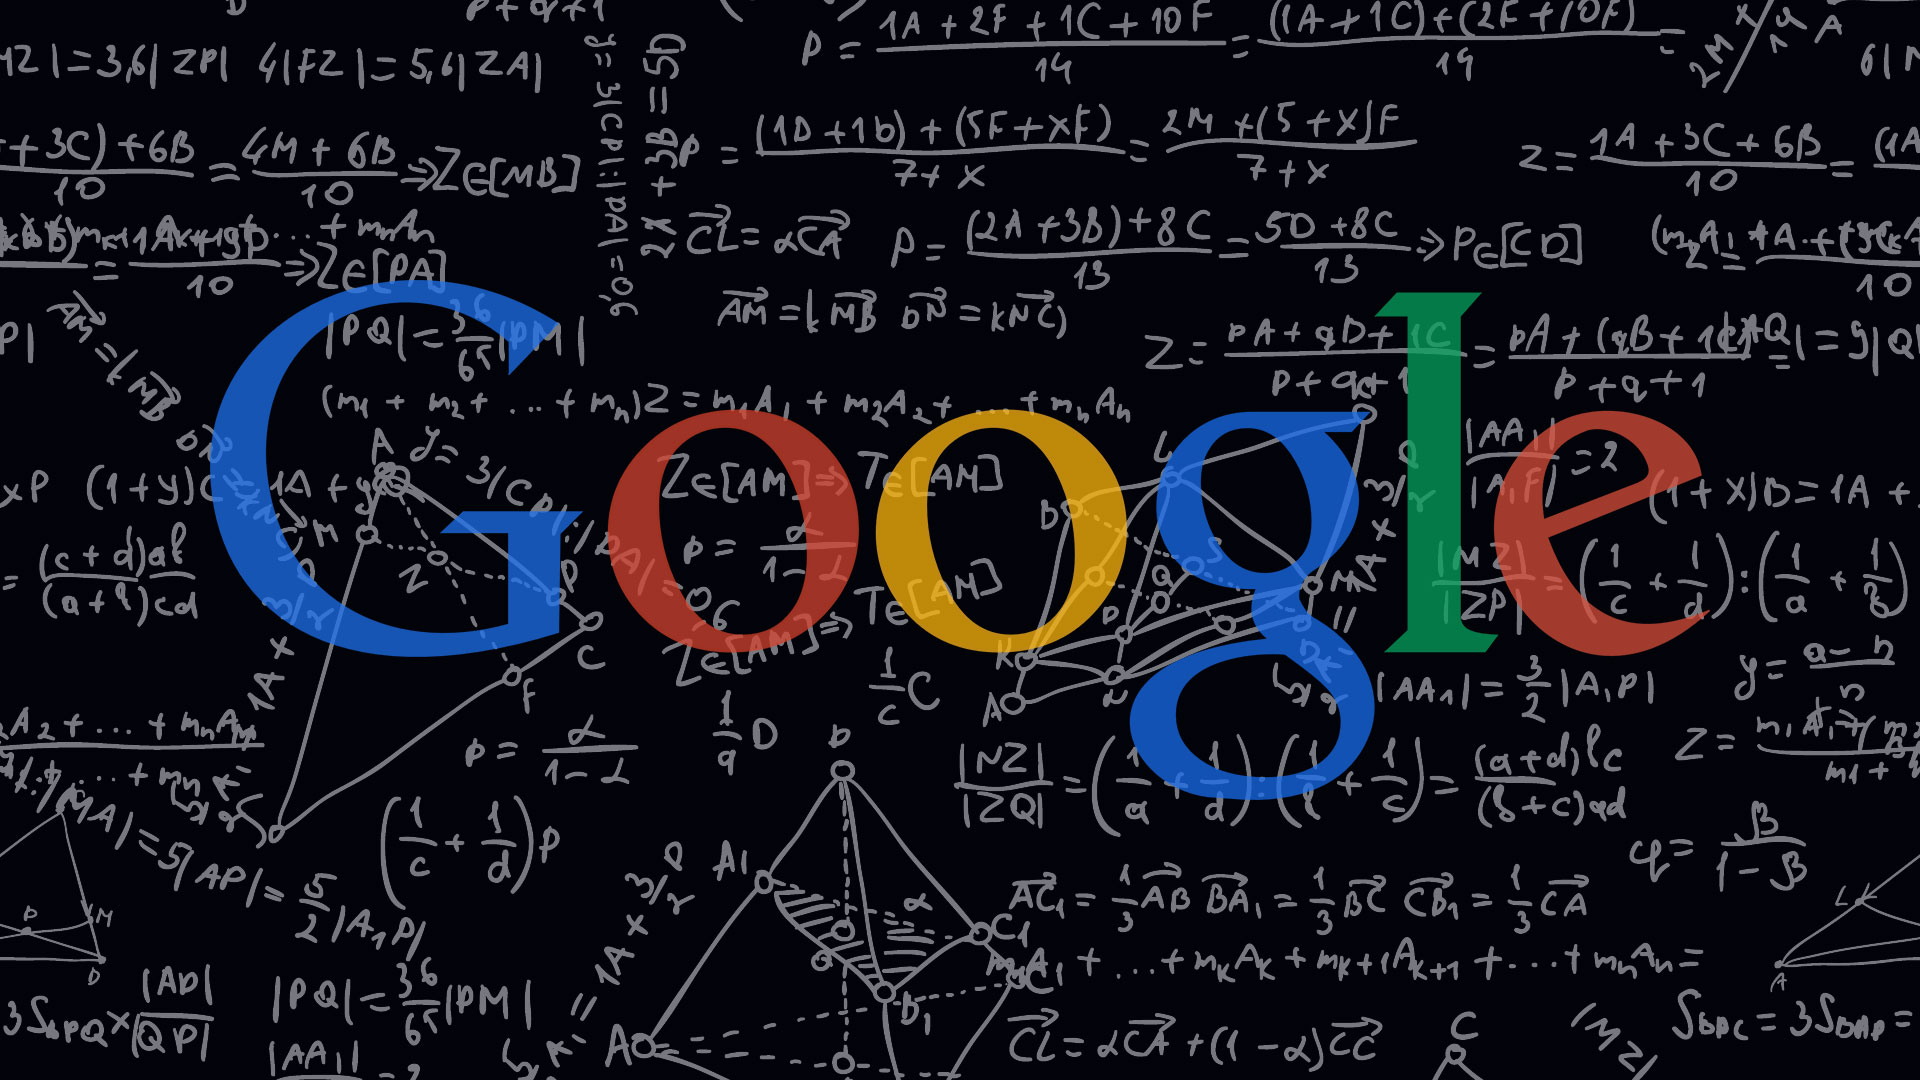 Алгоритмы Гугл